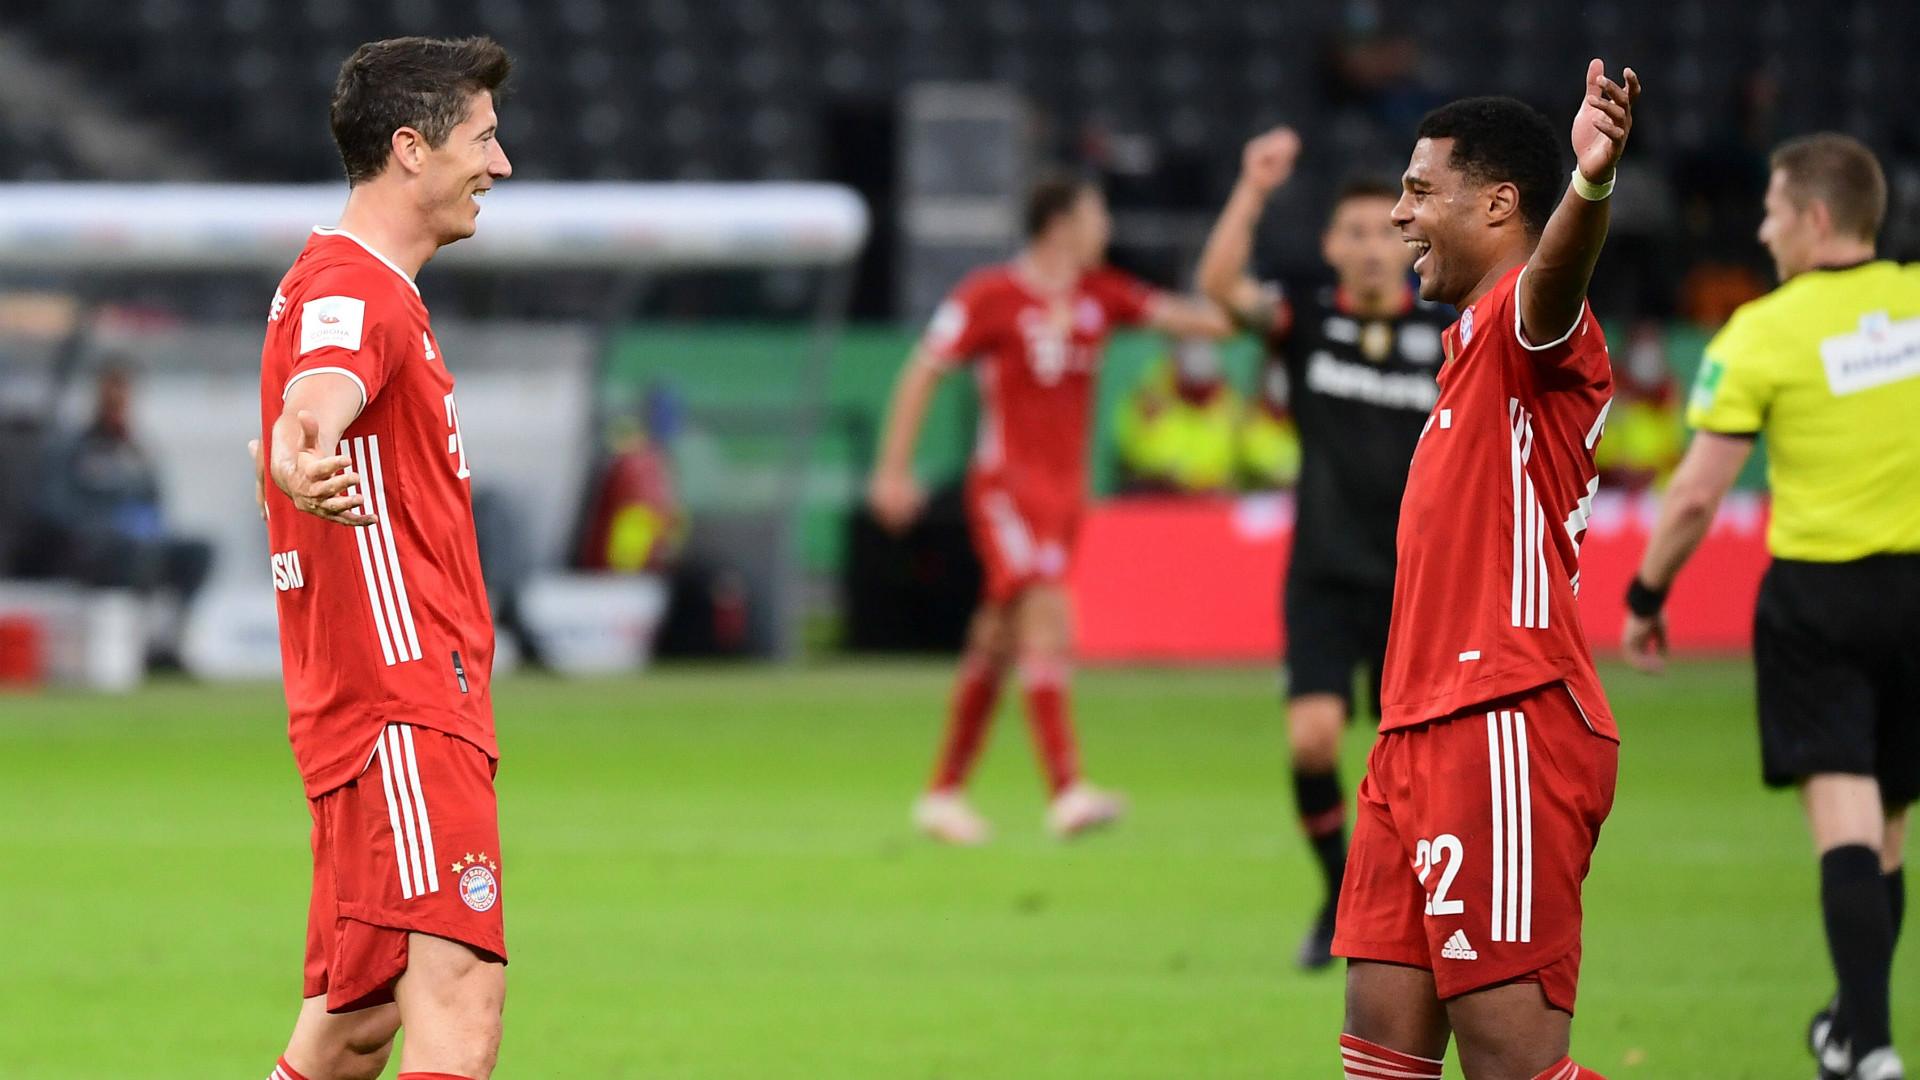 Sechs Tore Spektakel Im DFB Pokal Finale FC Bayern